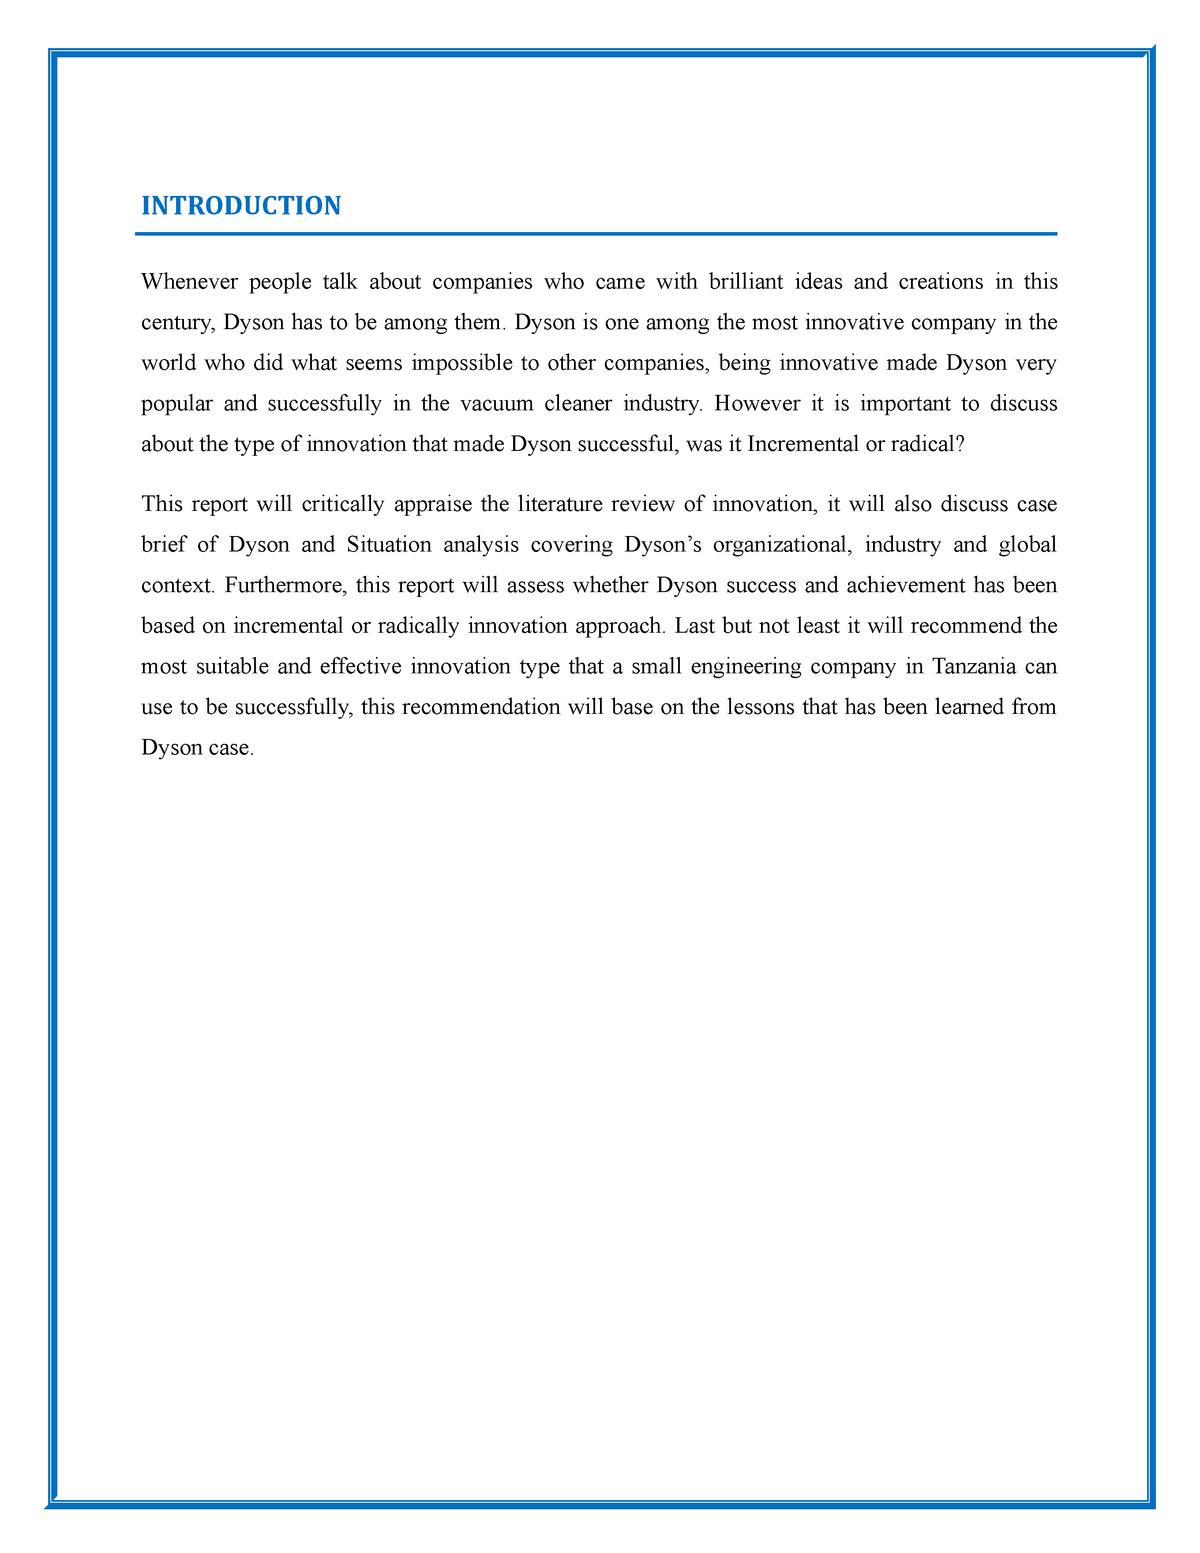 Dyson Assignment - Final Course Assessment - BUSN11075 - UWS